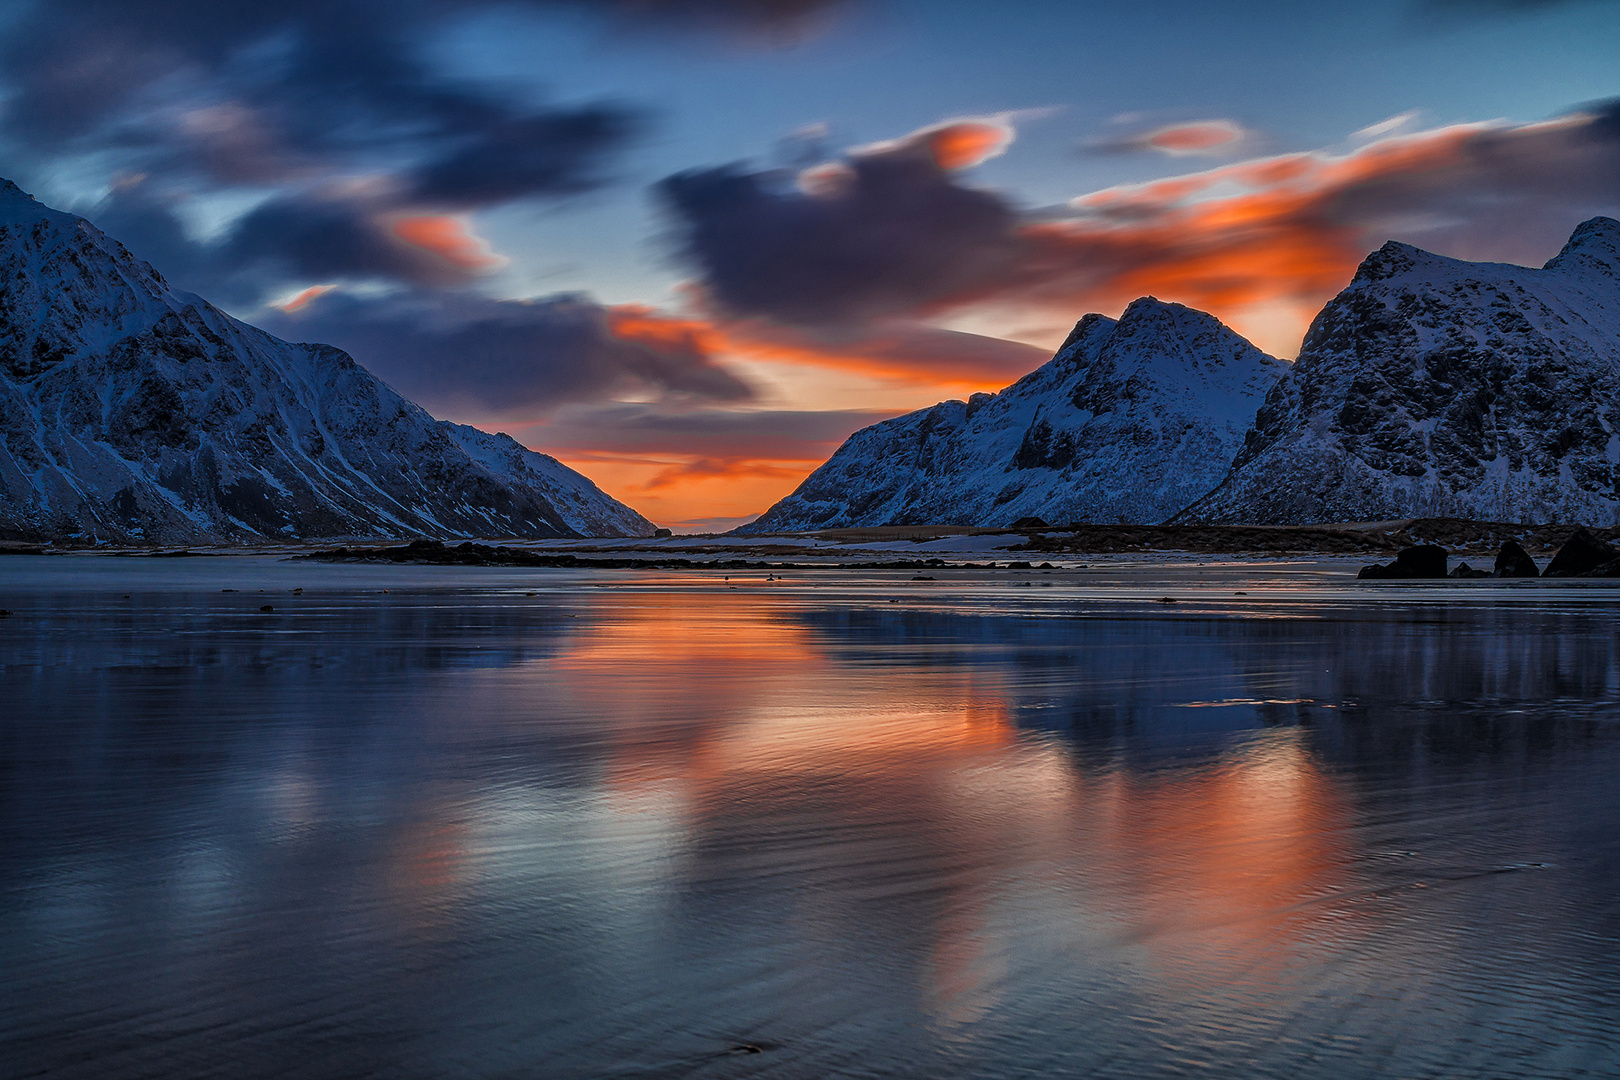 Sonnenaufgang am Skagsanden